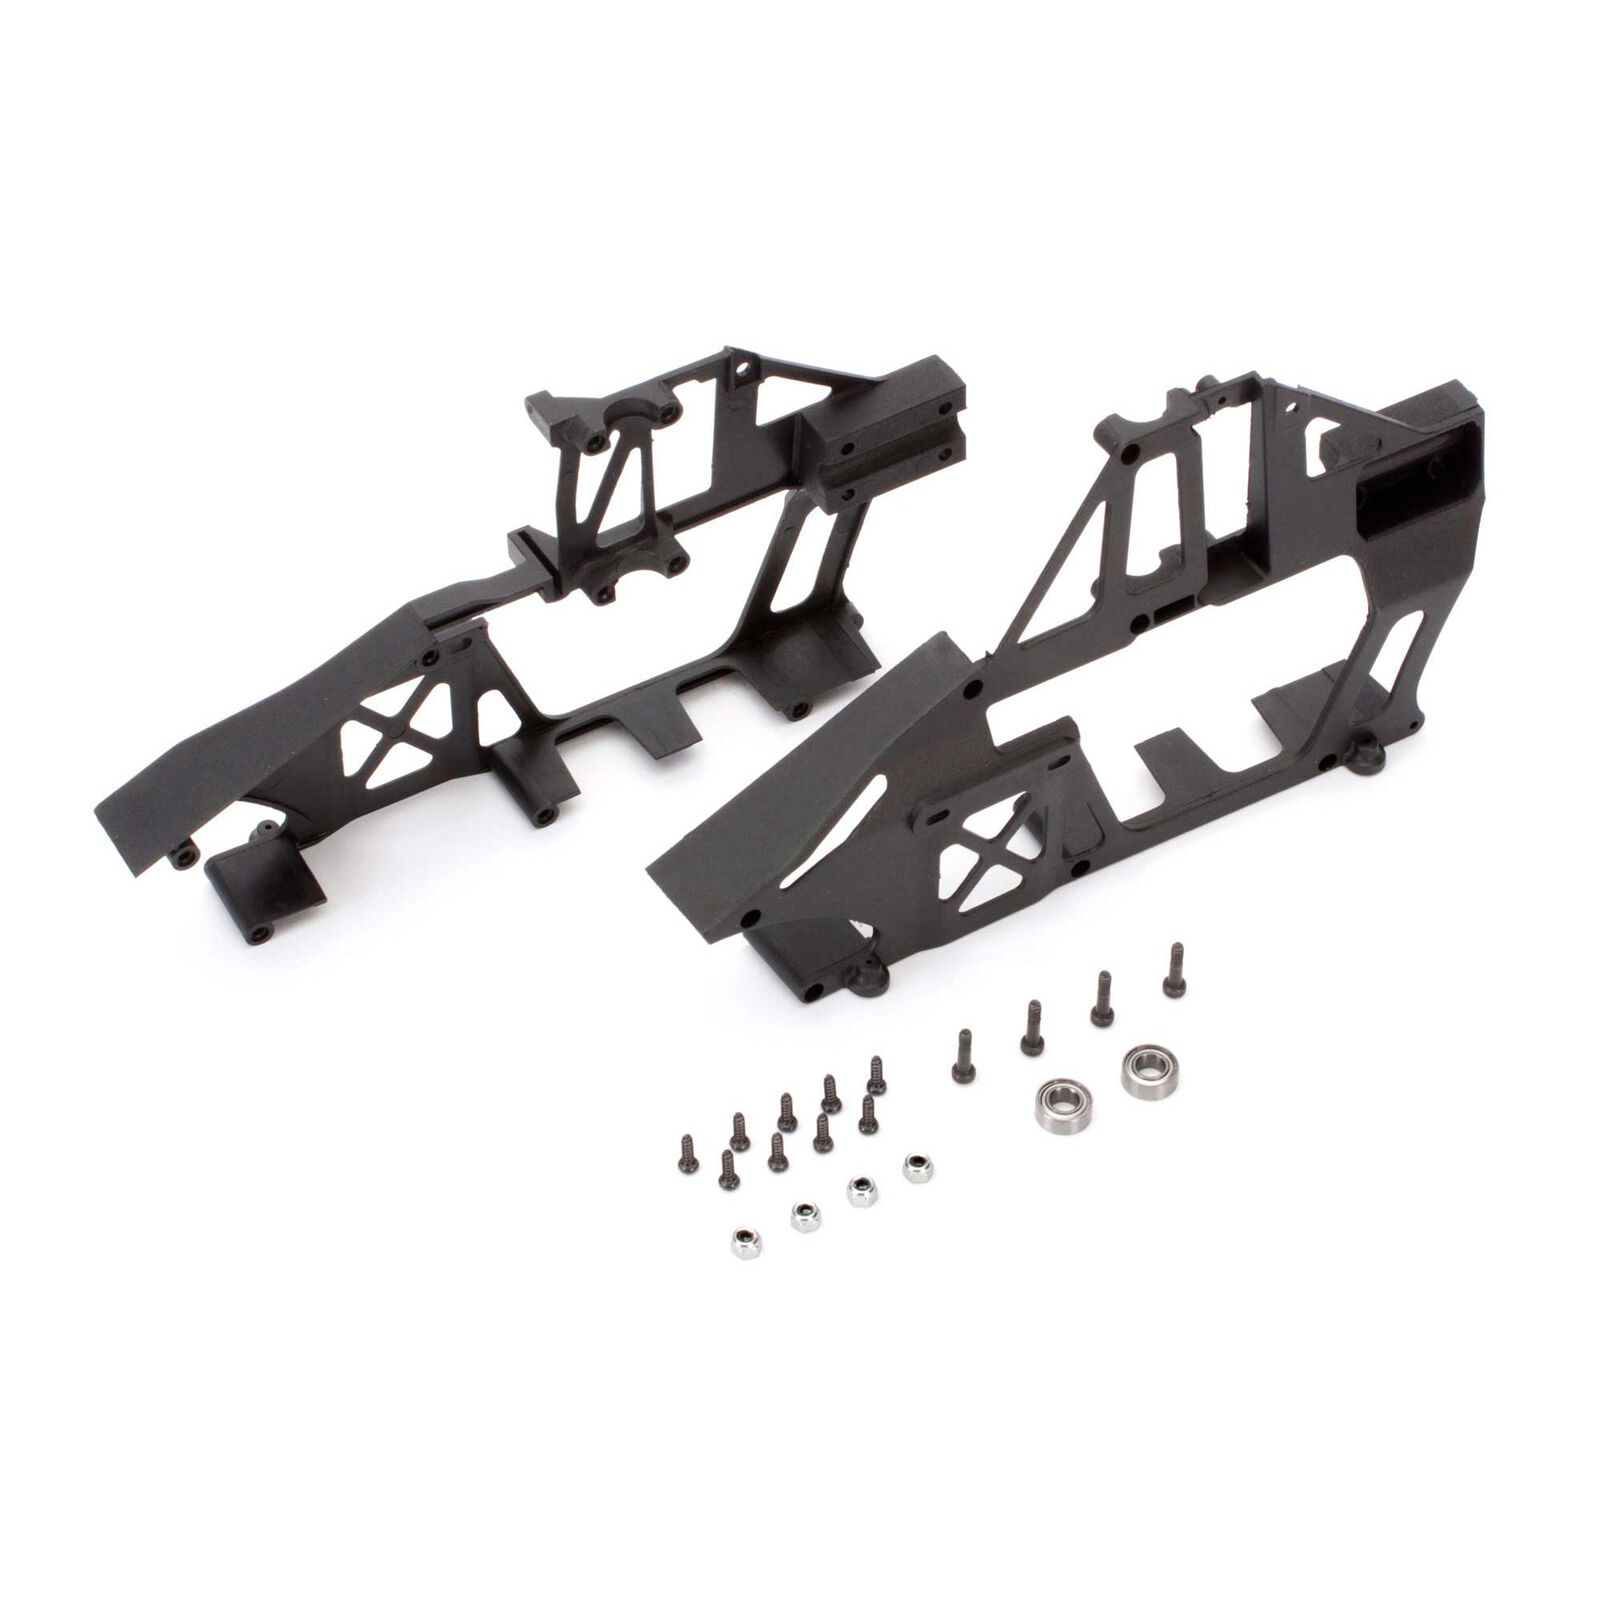 Blade 200 SR X: Rahmen